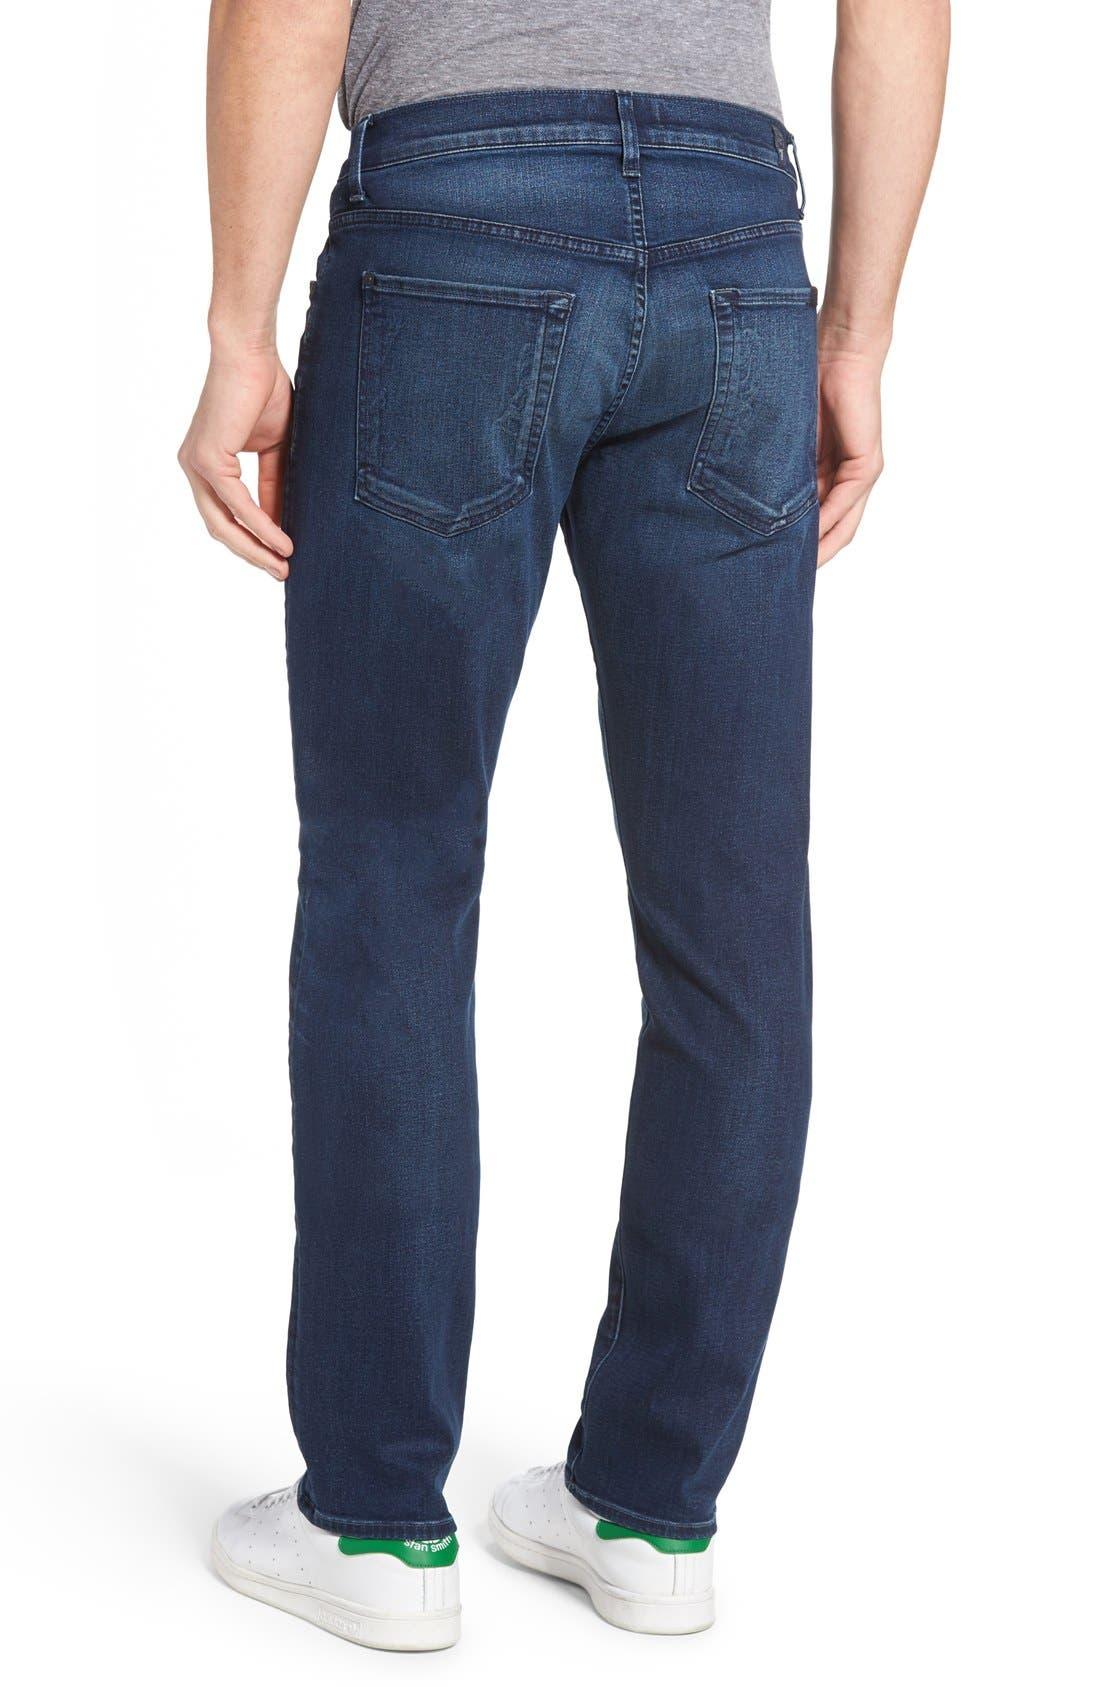 Slimmy Luxe Performance Slim Fit Jeans,                             Alternate thumbnail 2, color,                             Belfast